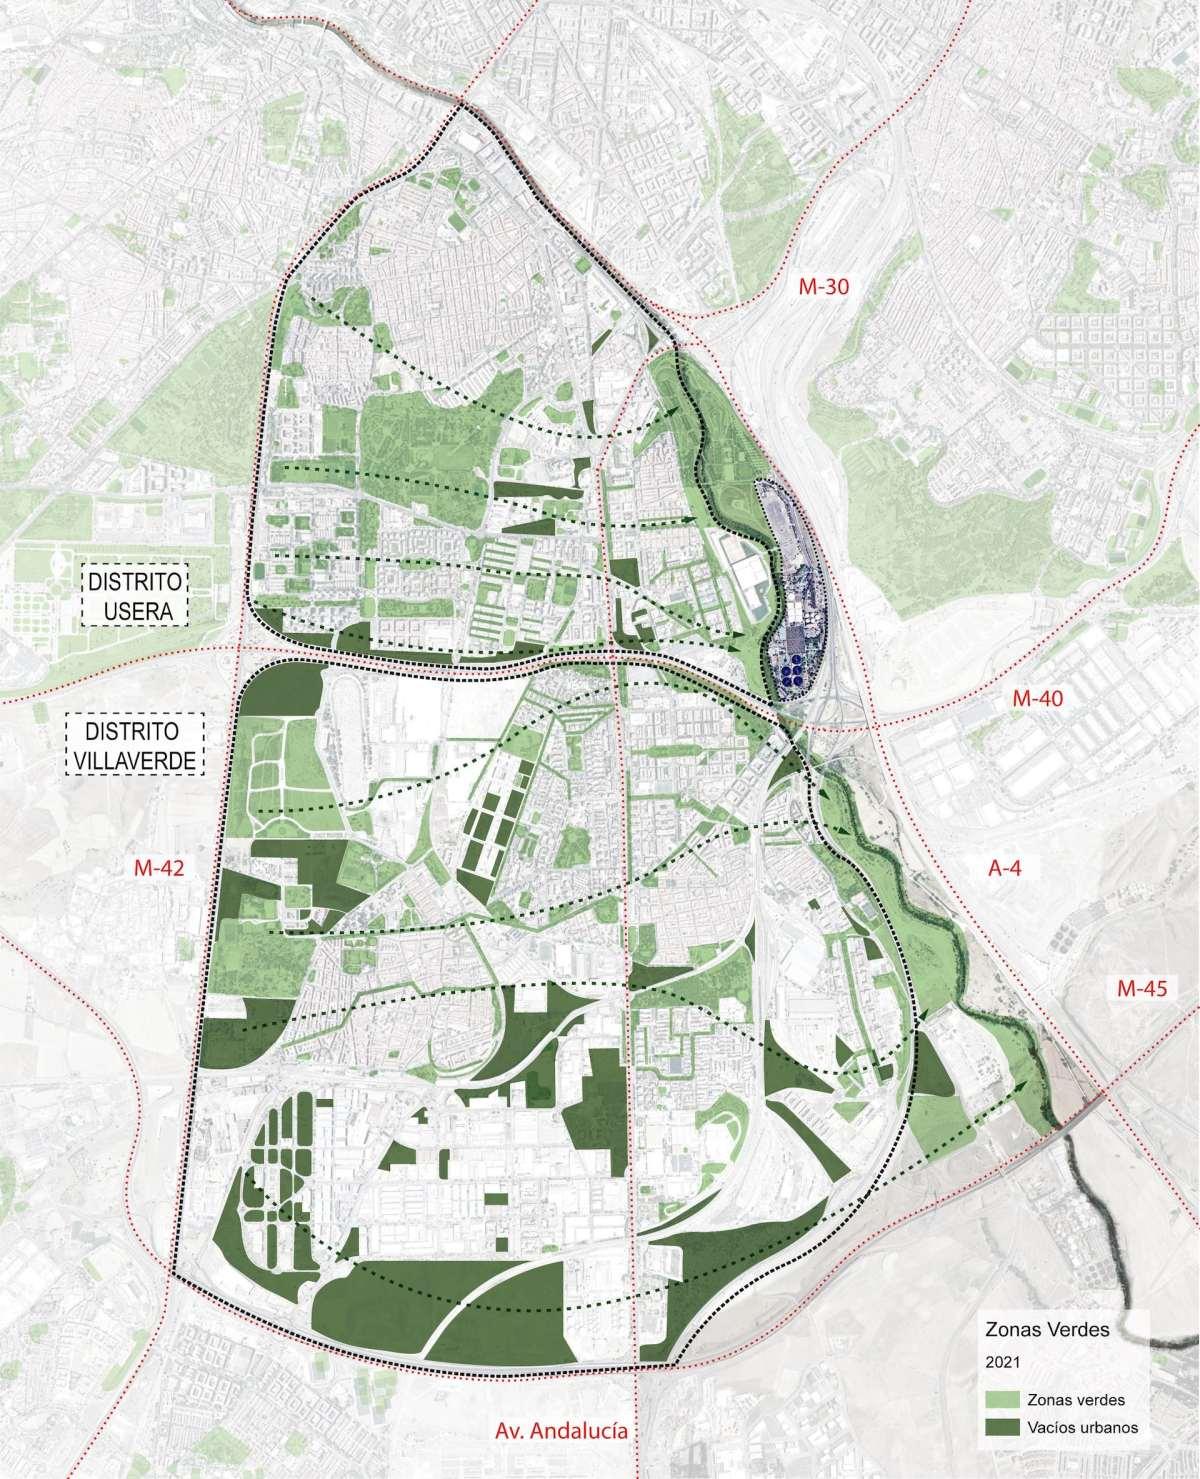 Mapa de zonas verdes